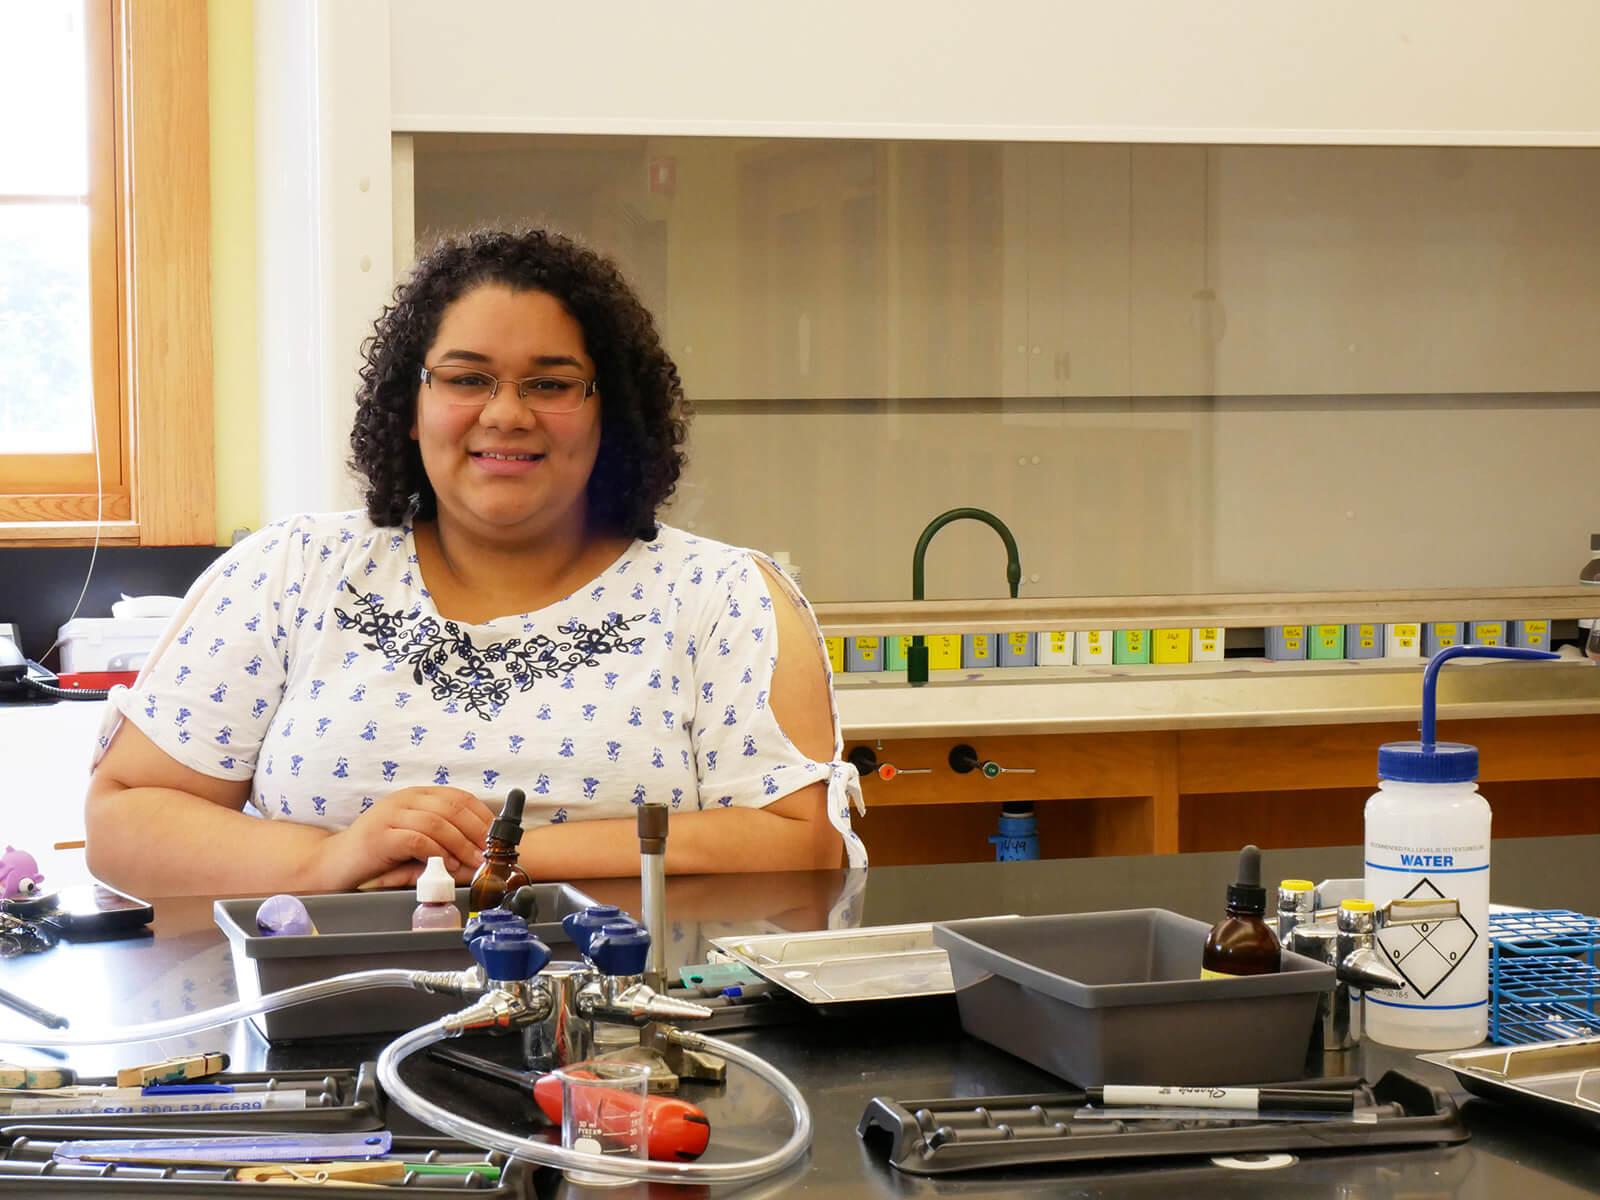 MS in Biomedical Sciences graduate Elizabeth Amaro-Gonzalez